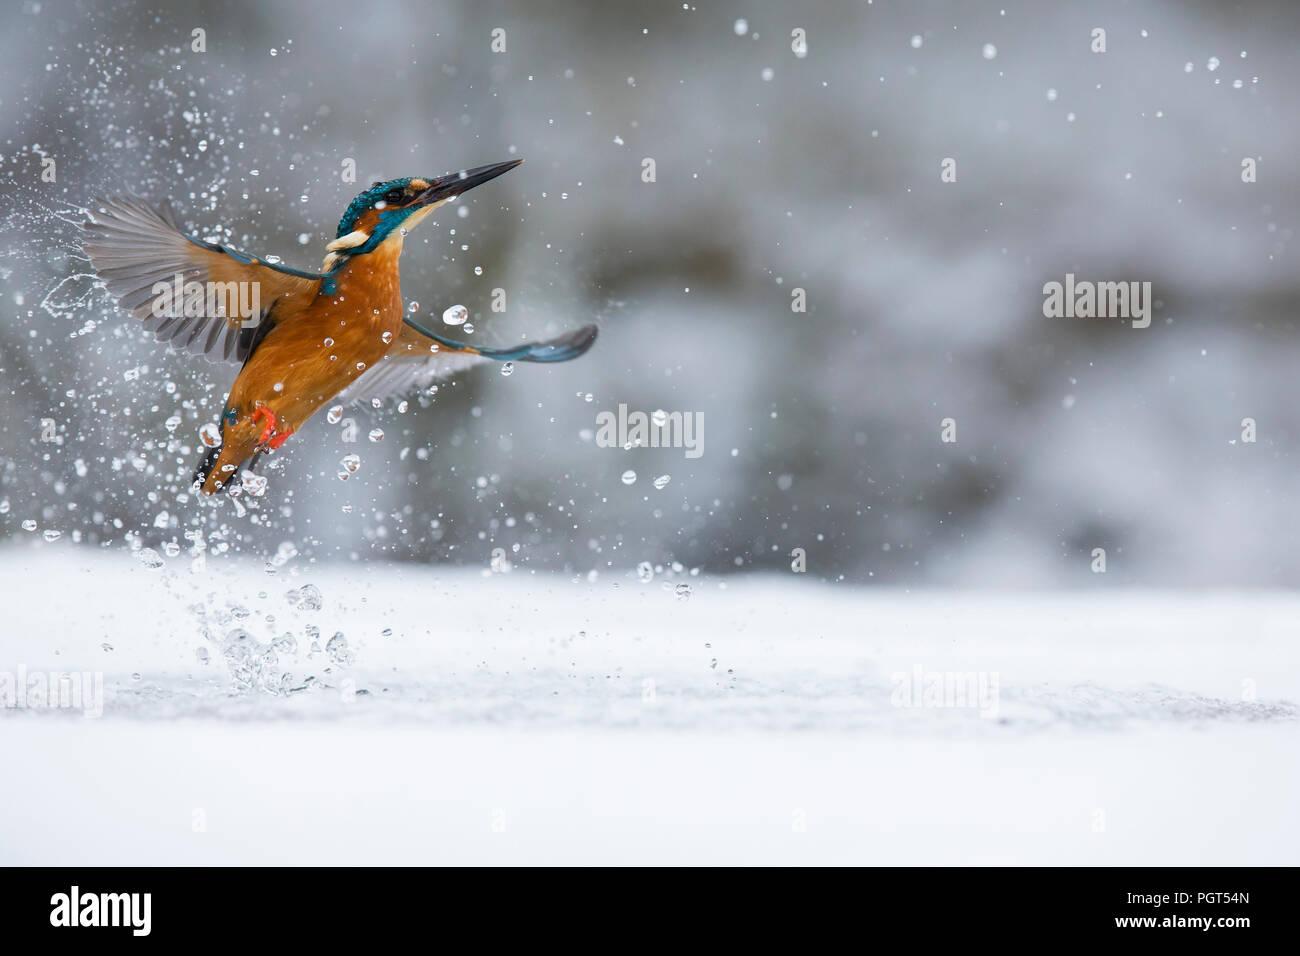 Kingfisher (Alcedo atthis) pêche à travers un trou dans la glace Photo Stock